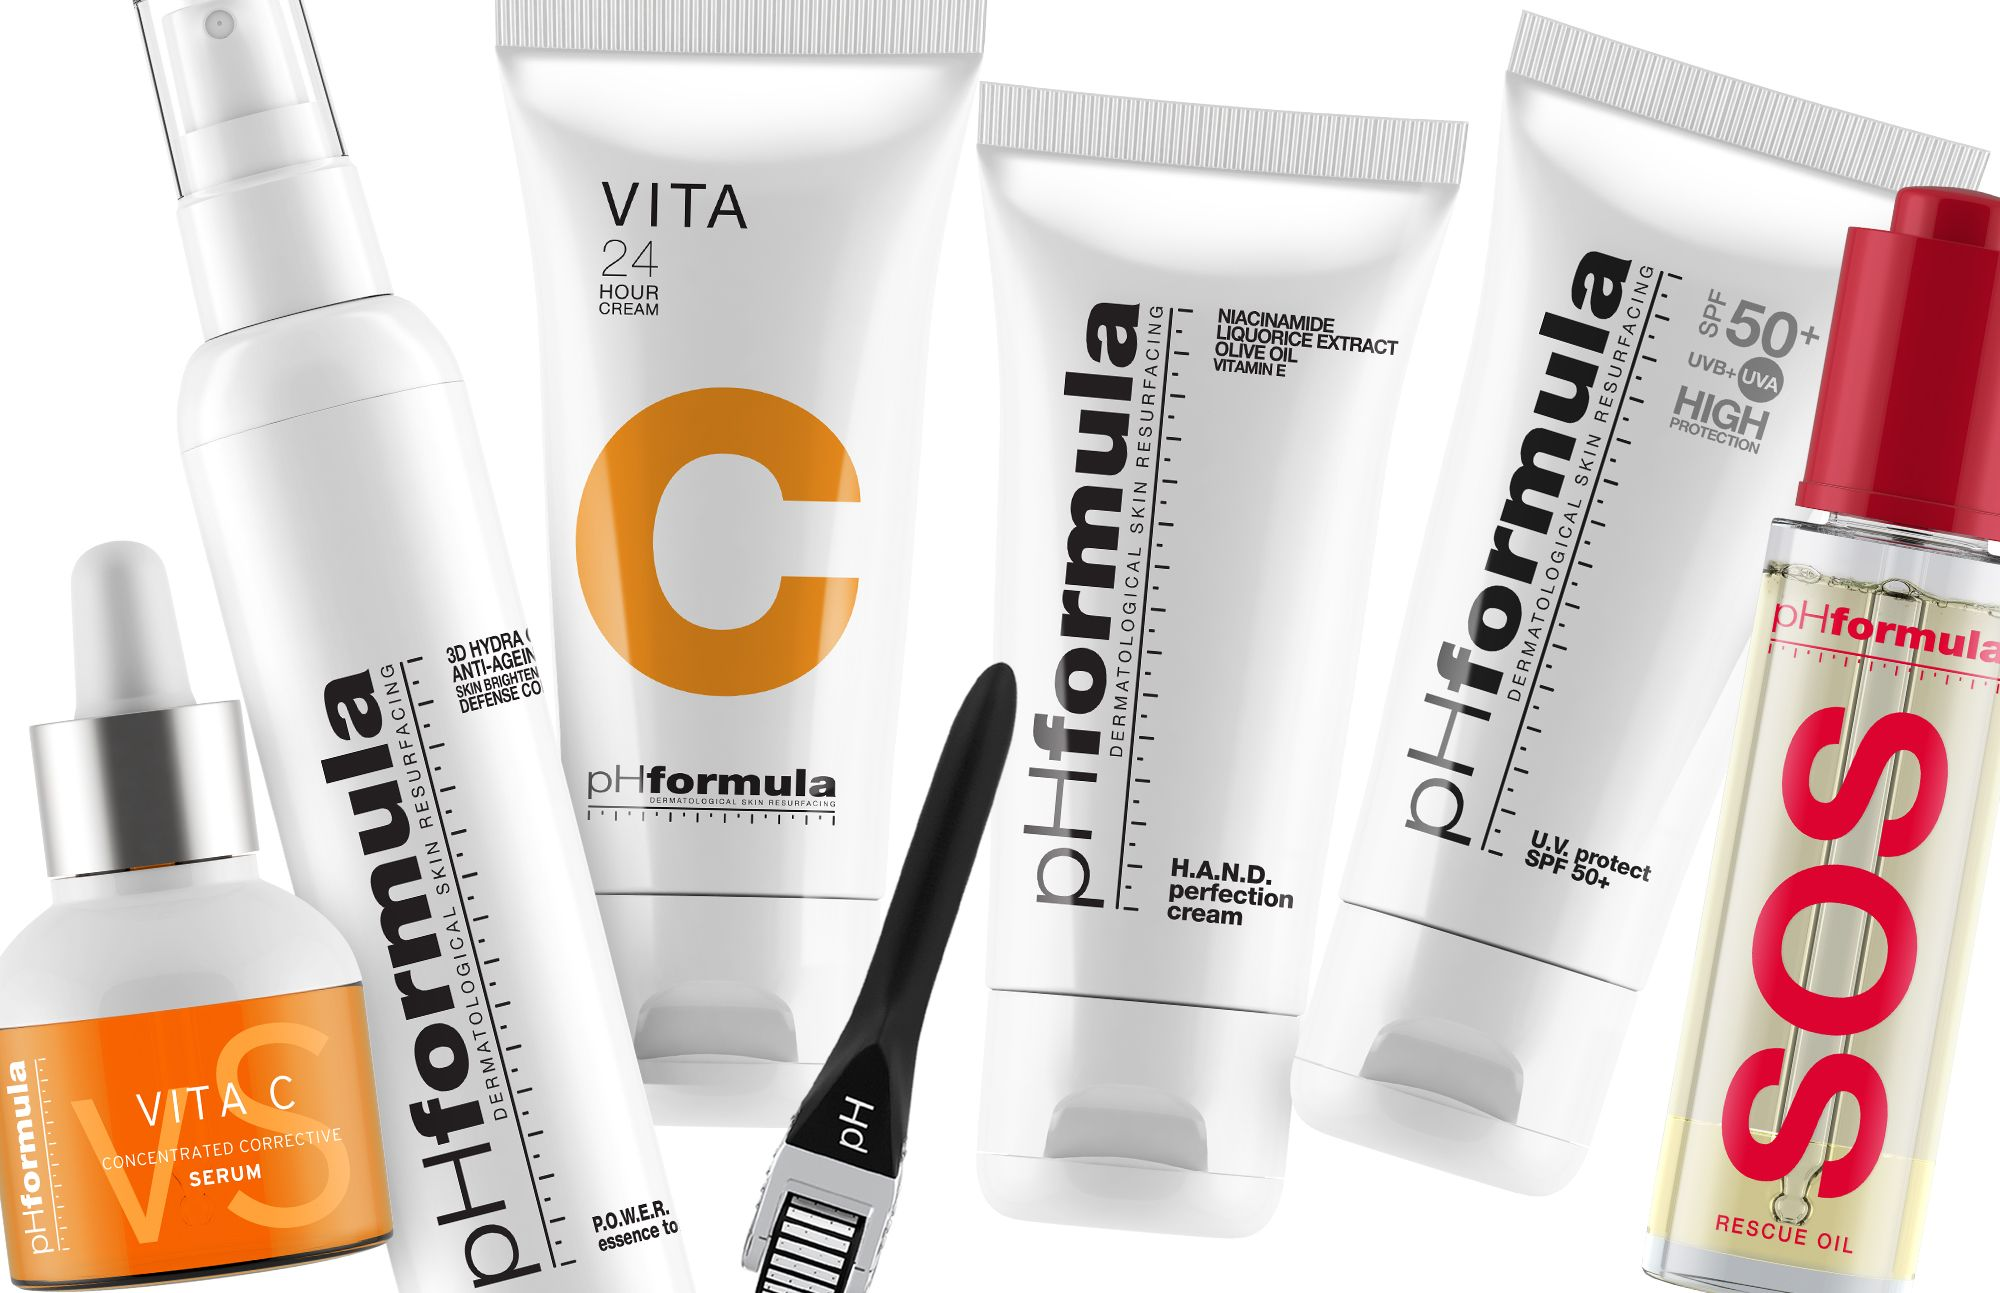 Phformula Leading International Skincare Brand Based In Barcelona